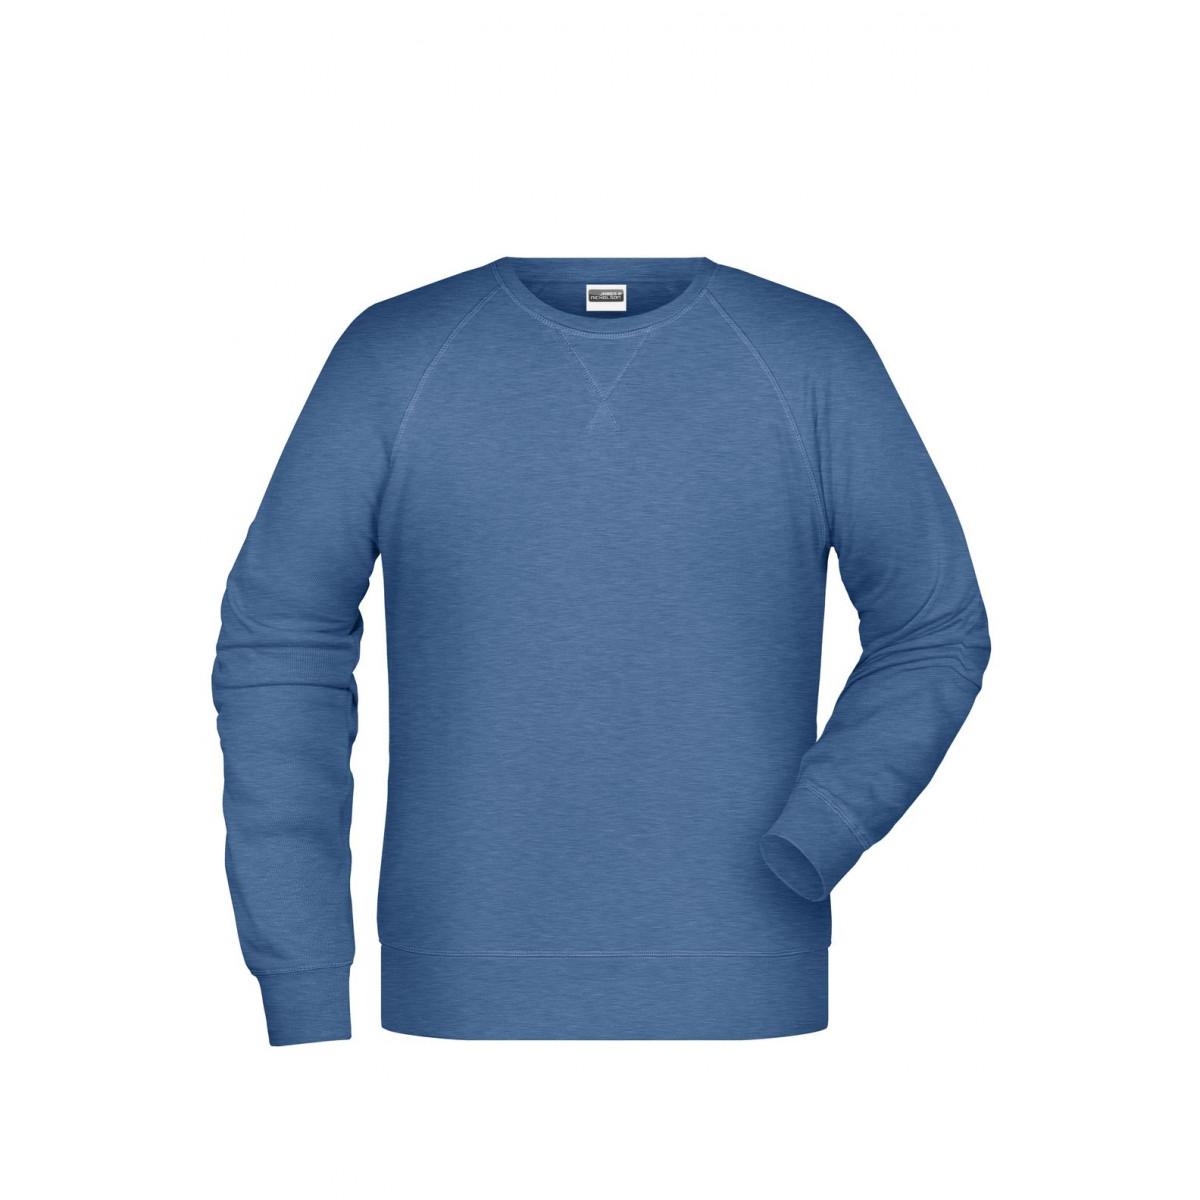 Толстовка мужская 8022 Men´s Sweat - Светло-синий меланж